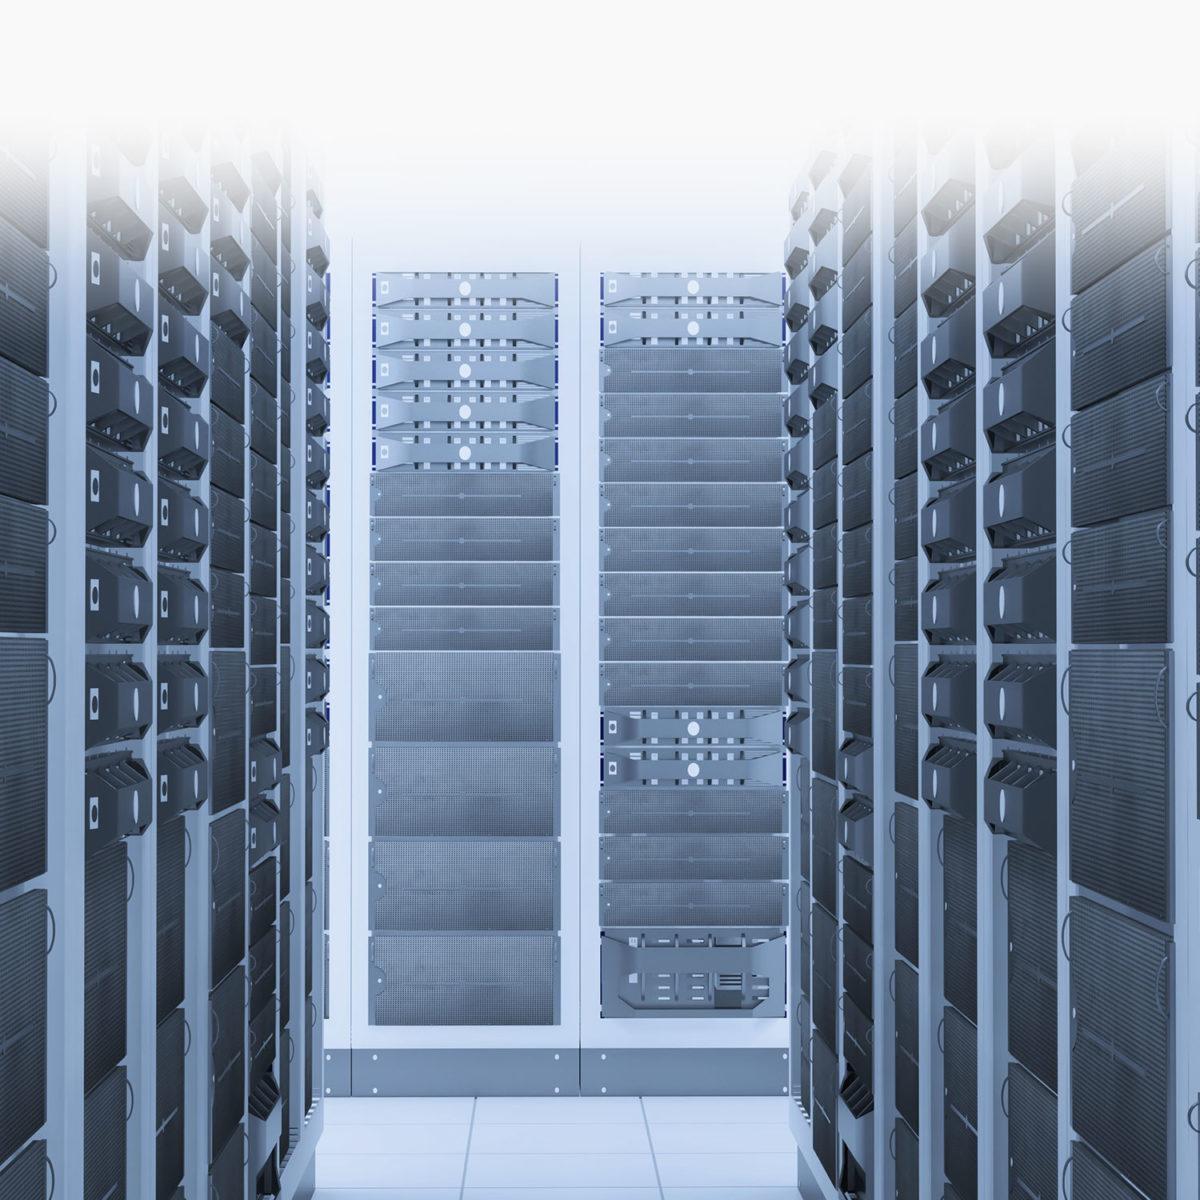 helpdesk și suport tehnic Data Center